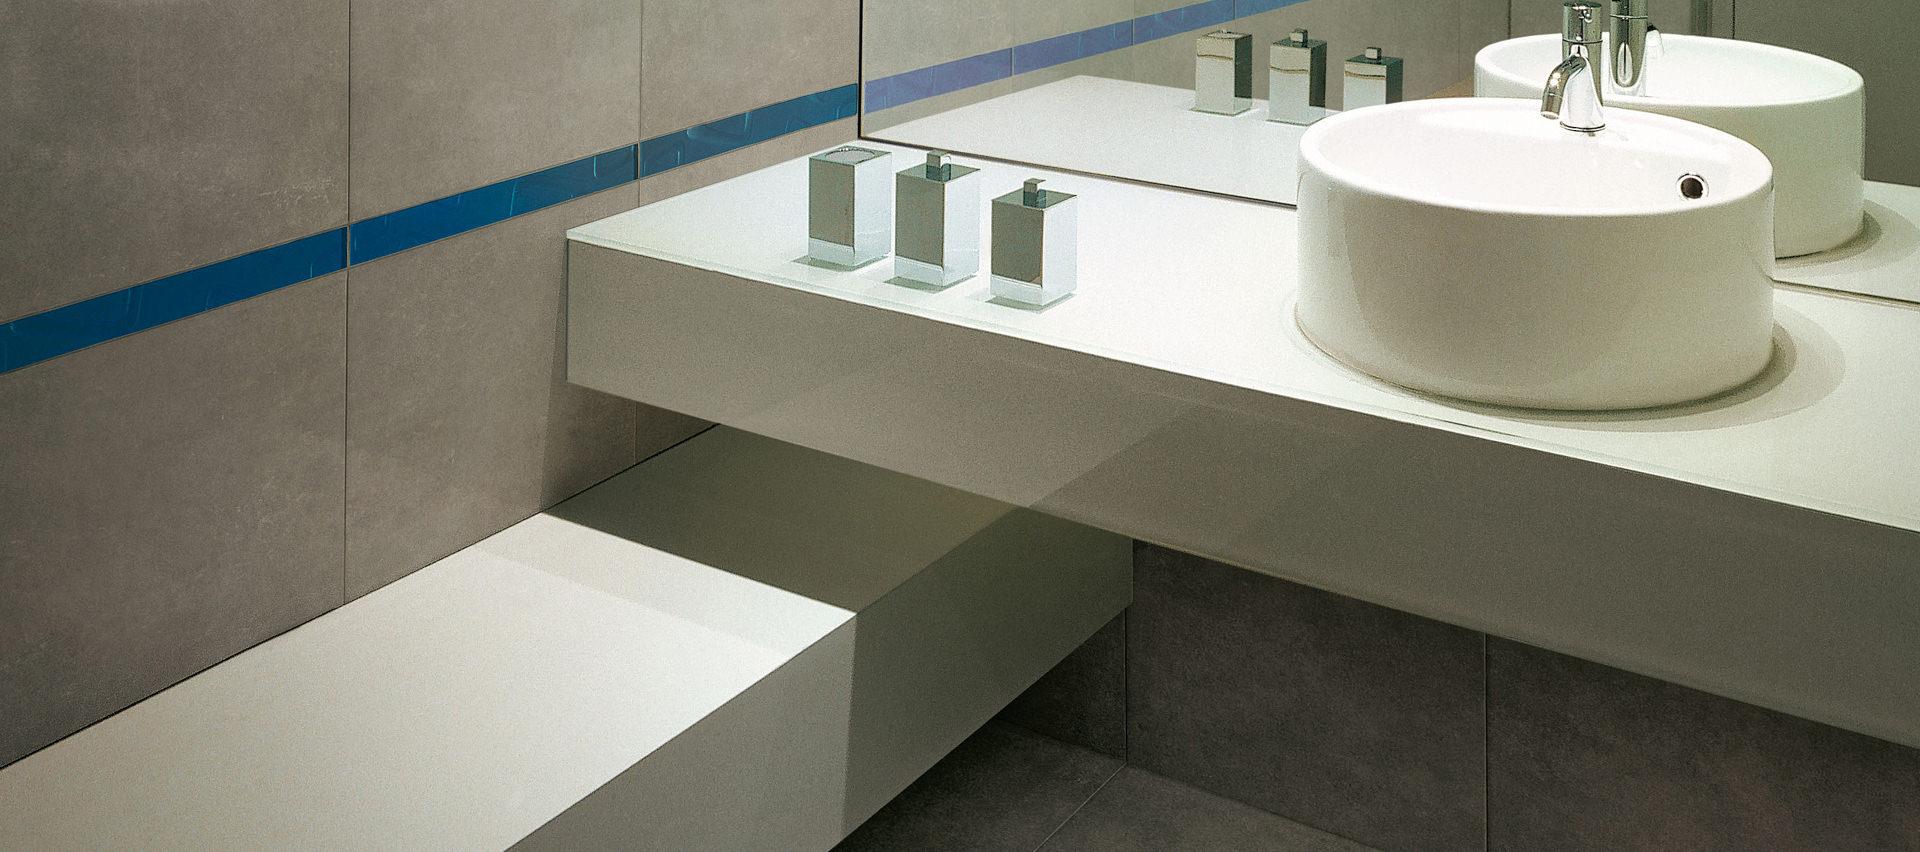 marca corona h ndler f r marca corona fliesen in pulheim bei k ln. Black Bedroom Furniture Sets. Home Design Ideas